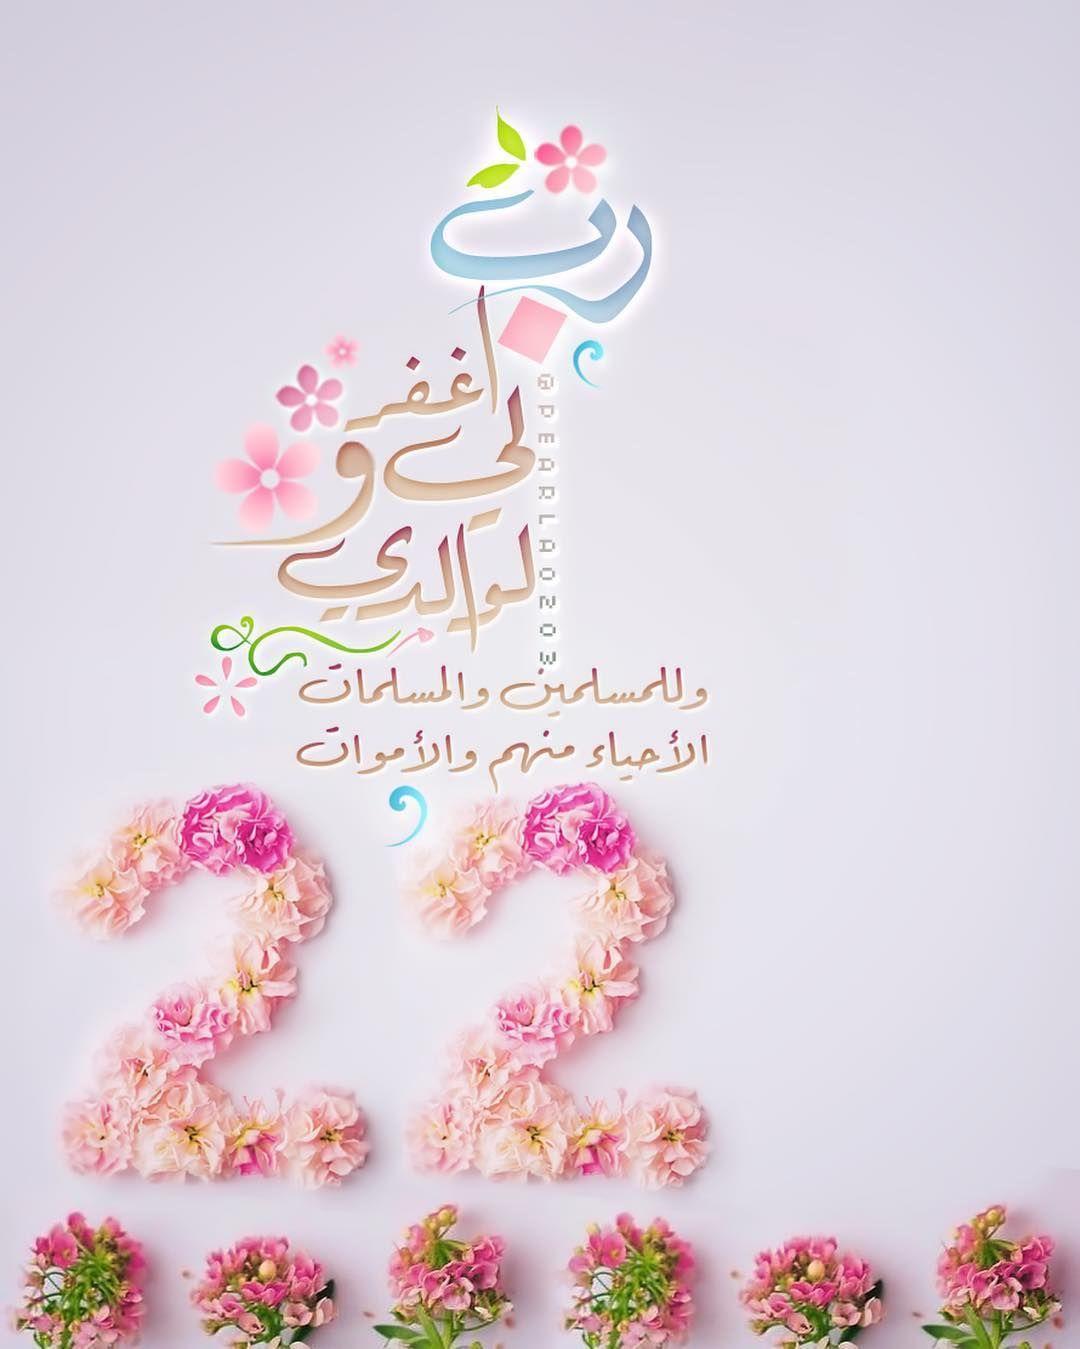 Instagram Photo By Pearla0203 Jun 27 2016 At 12 42am Utc Ramadan Kareem Decoration Ramadan Crafts Ramadan Decorations